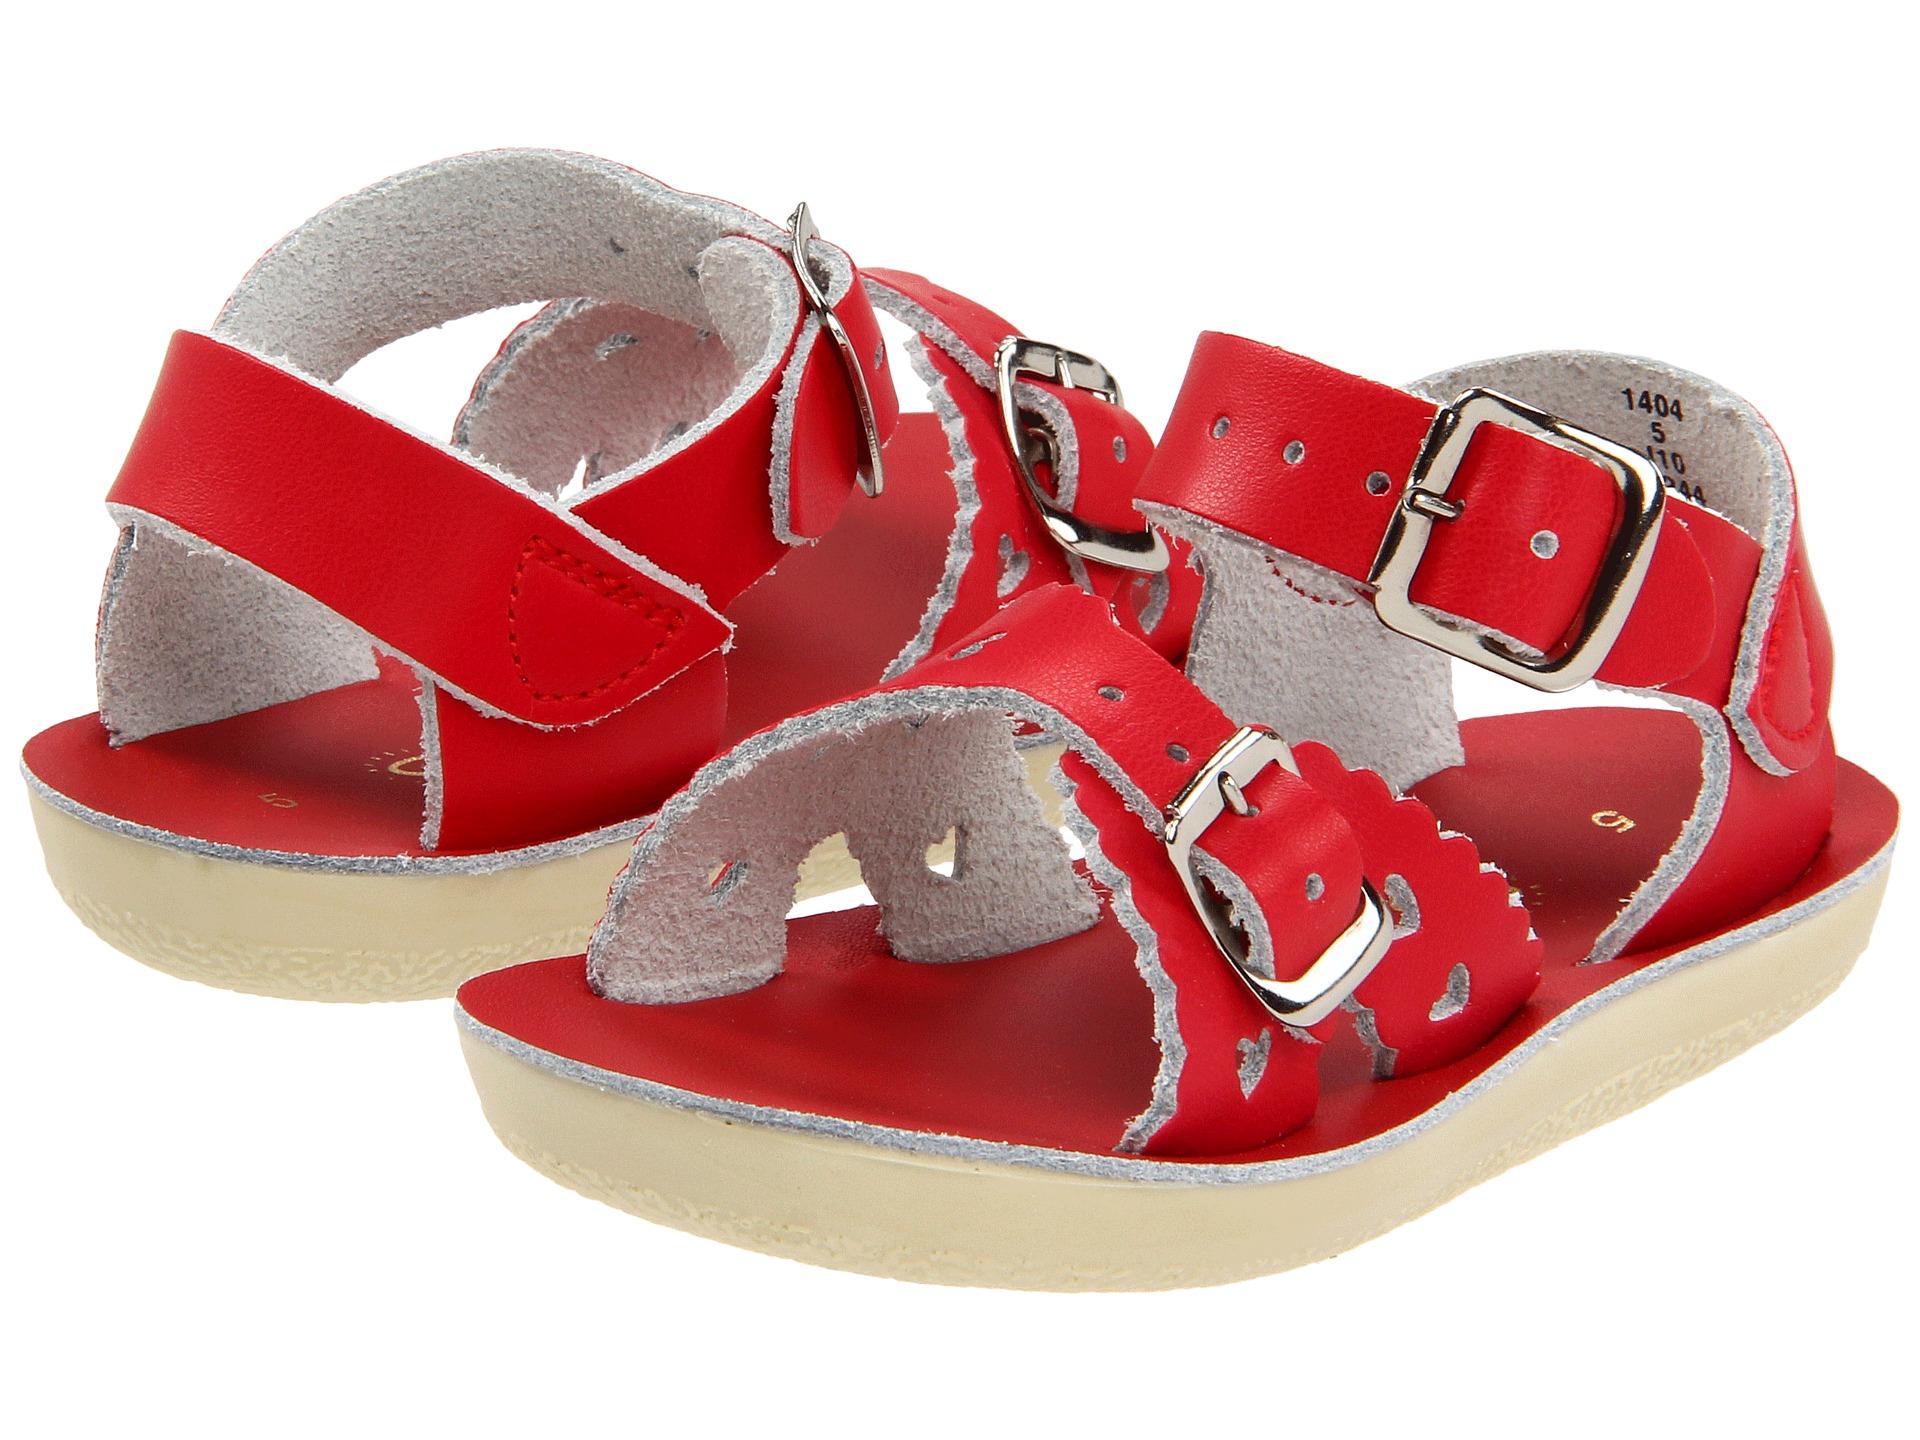 salt water sandal by hoy shoes sun san sweetheart toddler little kid red free. Black Bedroom Furniture Sets. Home Design Ideas